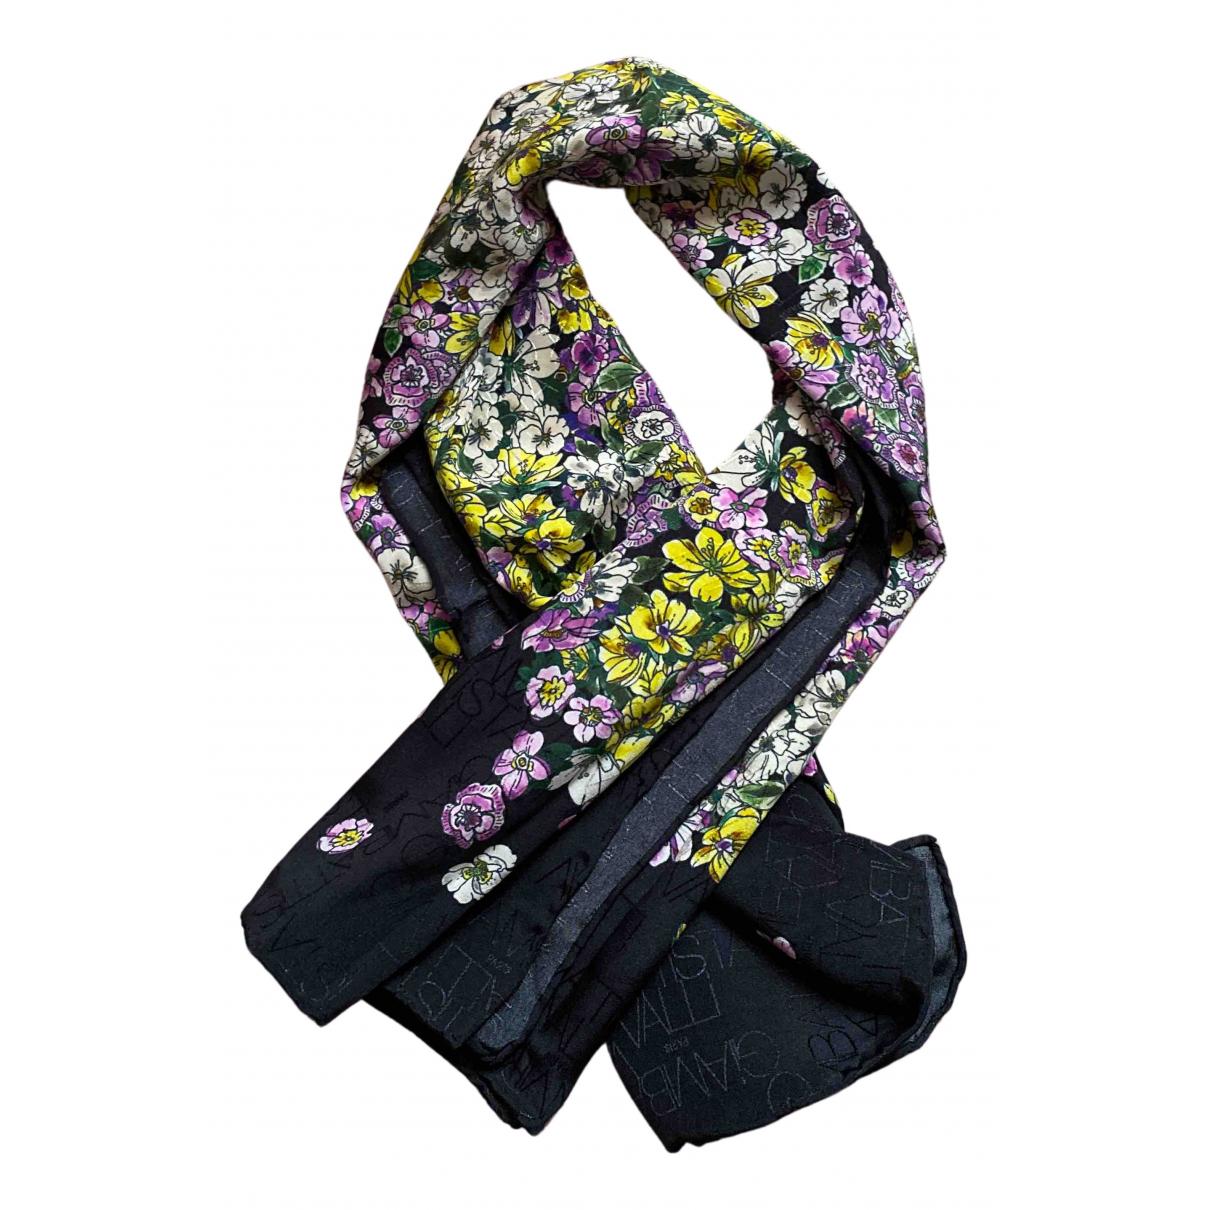 Giambattista Valli X H&m - Foulard   pour femme en soie - multicolore